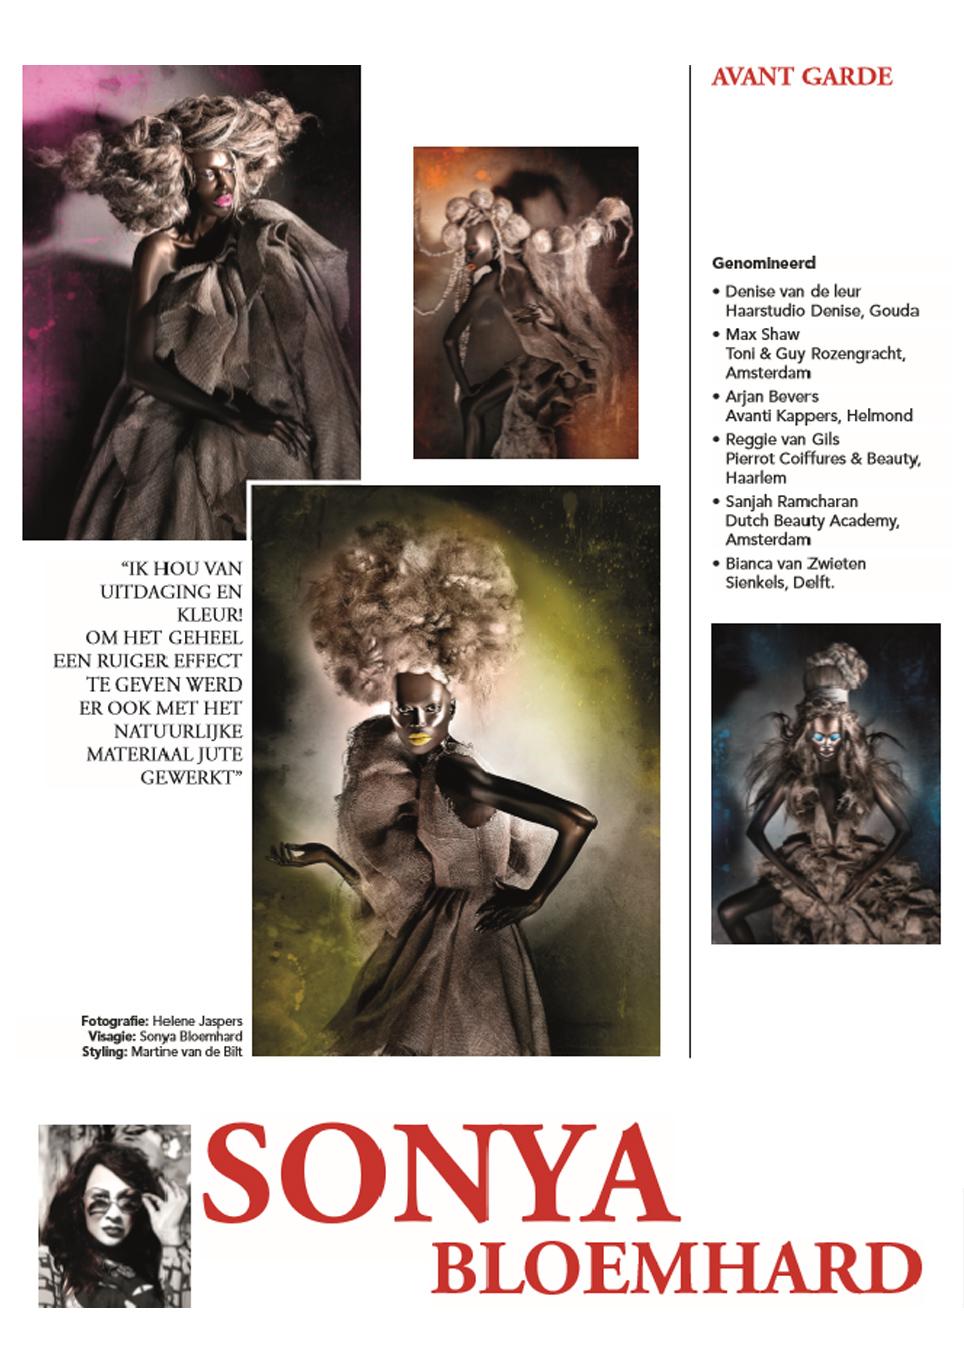 Avant Garde, Sonya Bloemhard